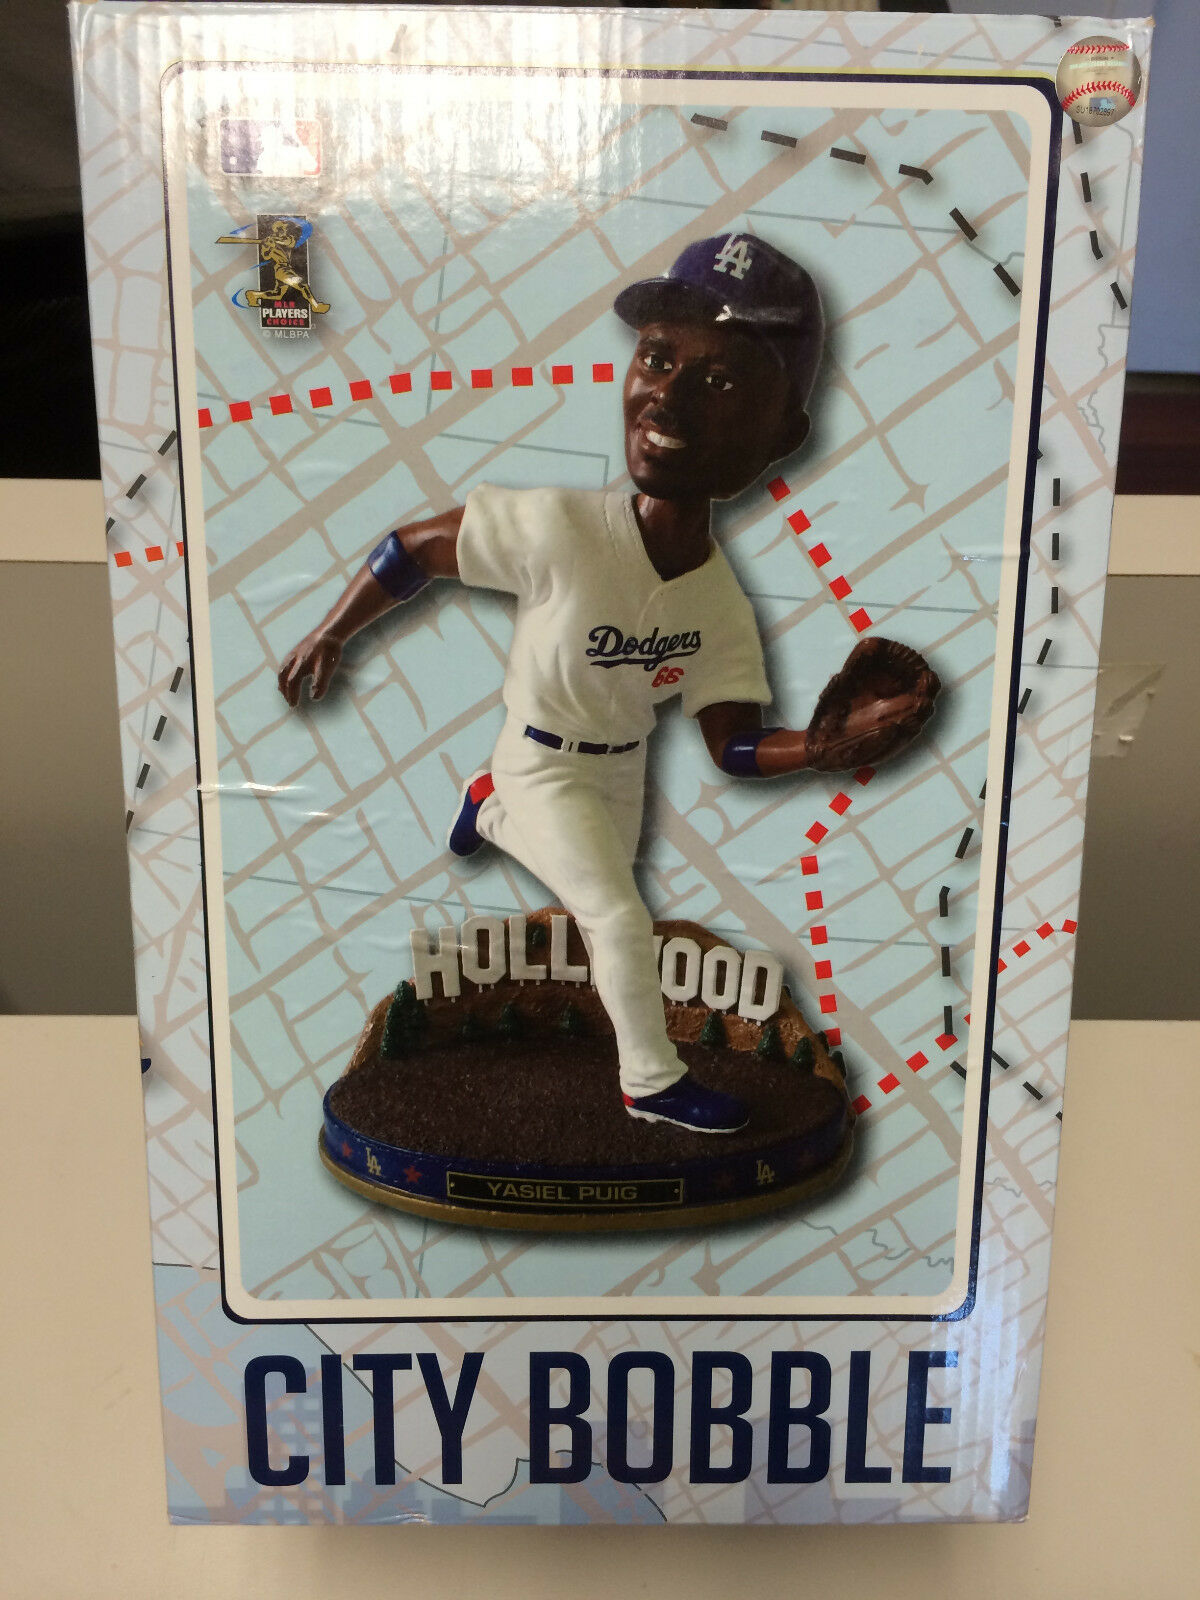 MLB Yasiel Puig LA Dodgers City Bobble Bobblehead